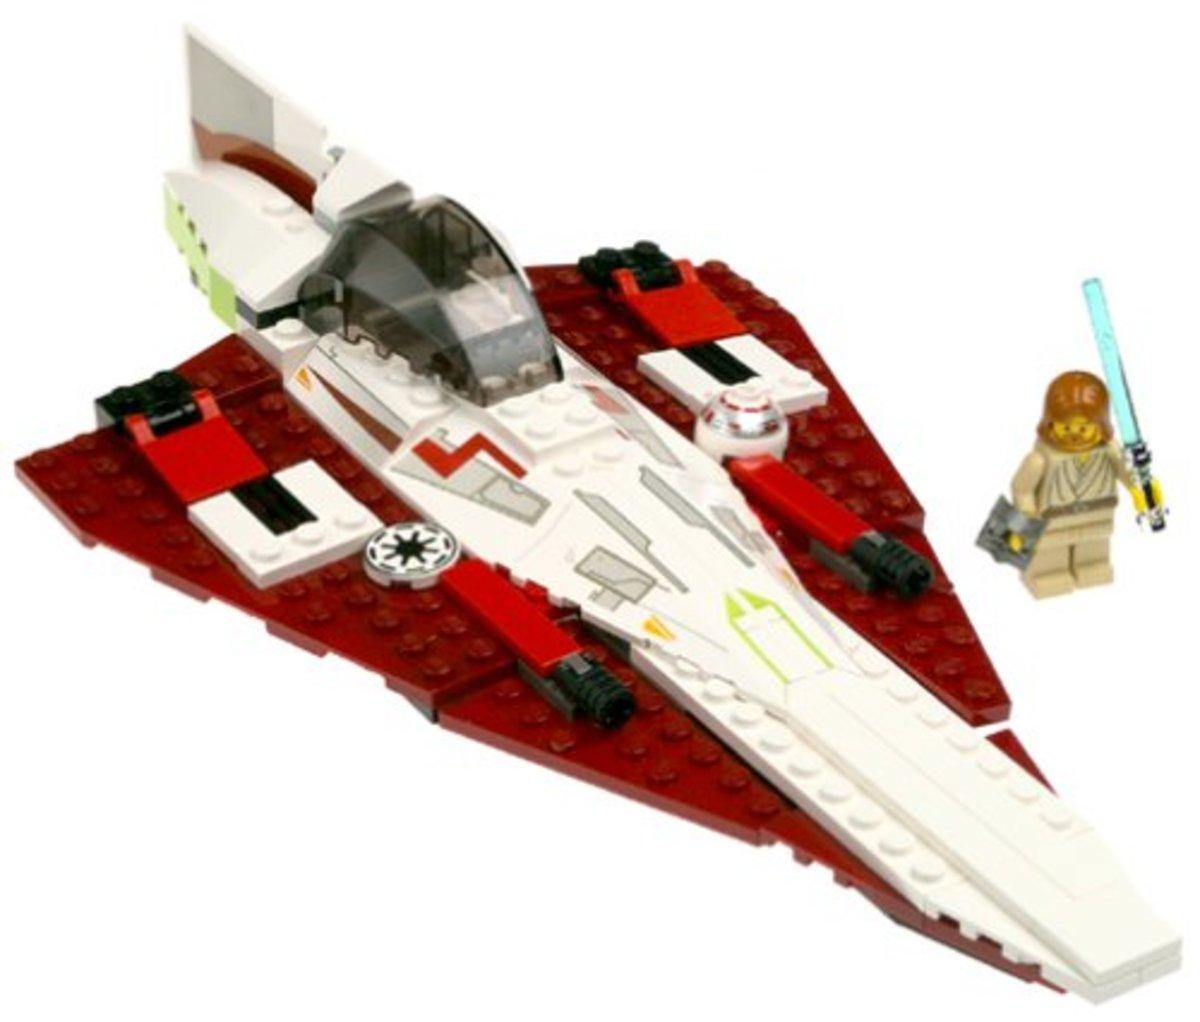 LEGO star wars Jedi Starfighter 7143 Assembled